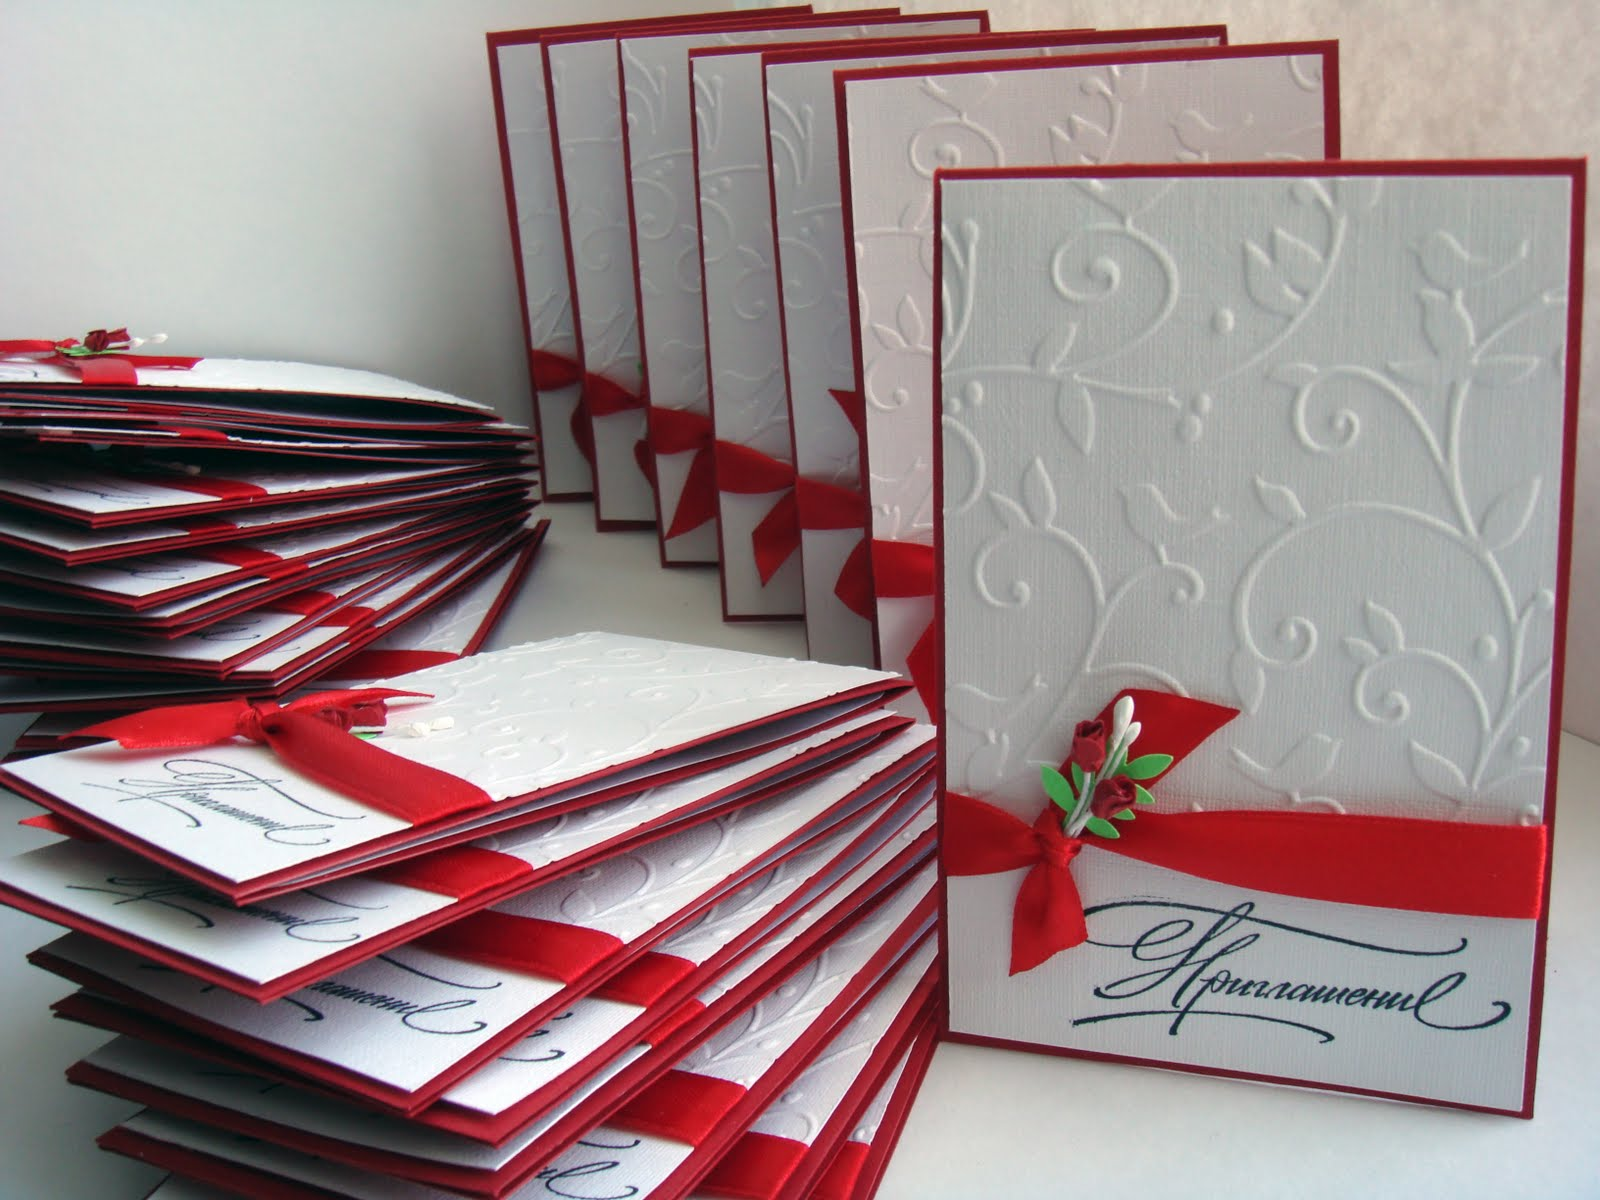 Красную книгу своими руками фото